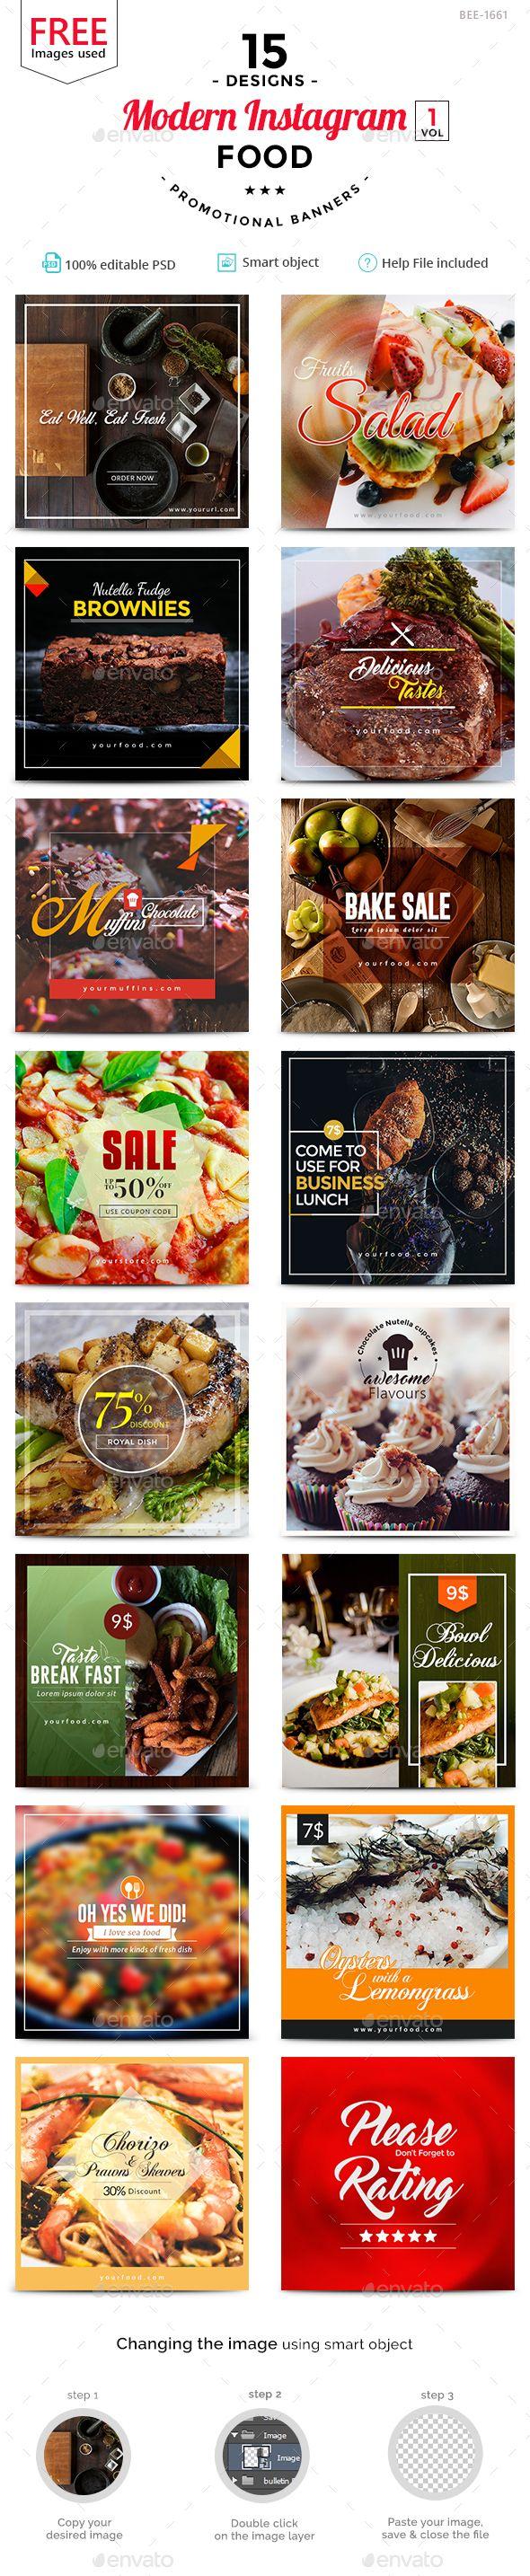 Food Instagram Templates - 15 Designs